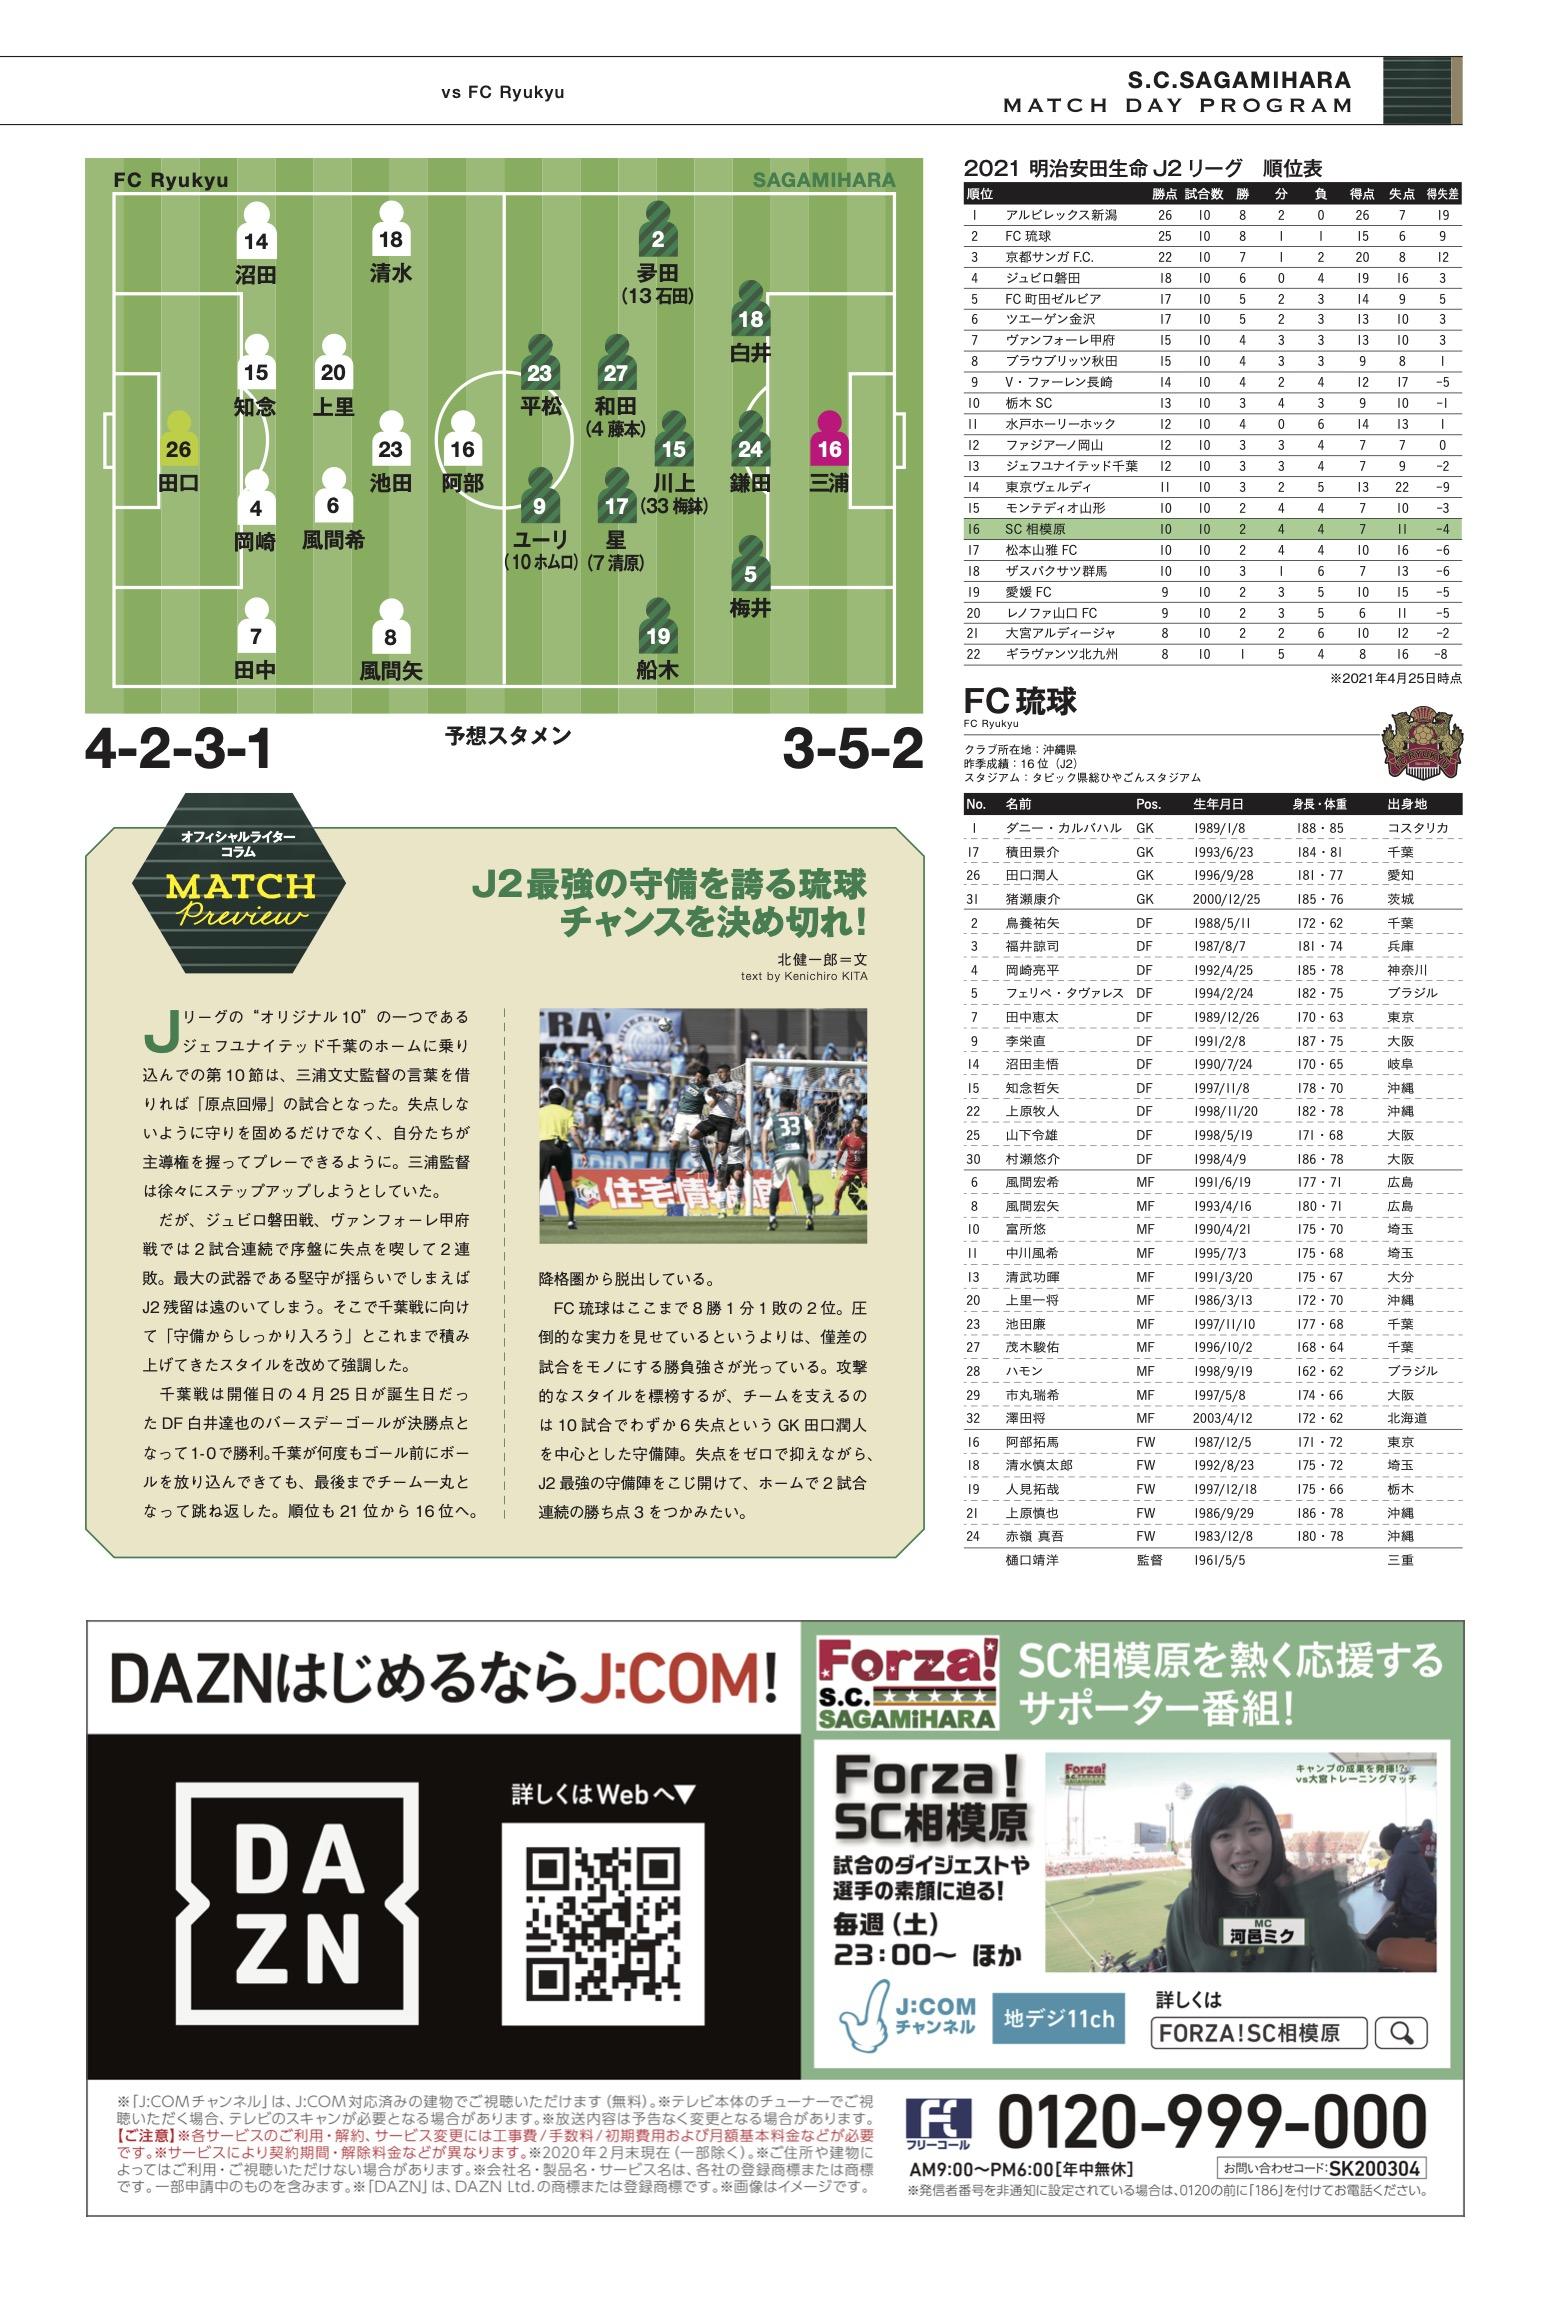 2021MDP_11節_琉球_HP用3.jpg